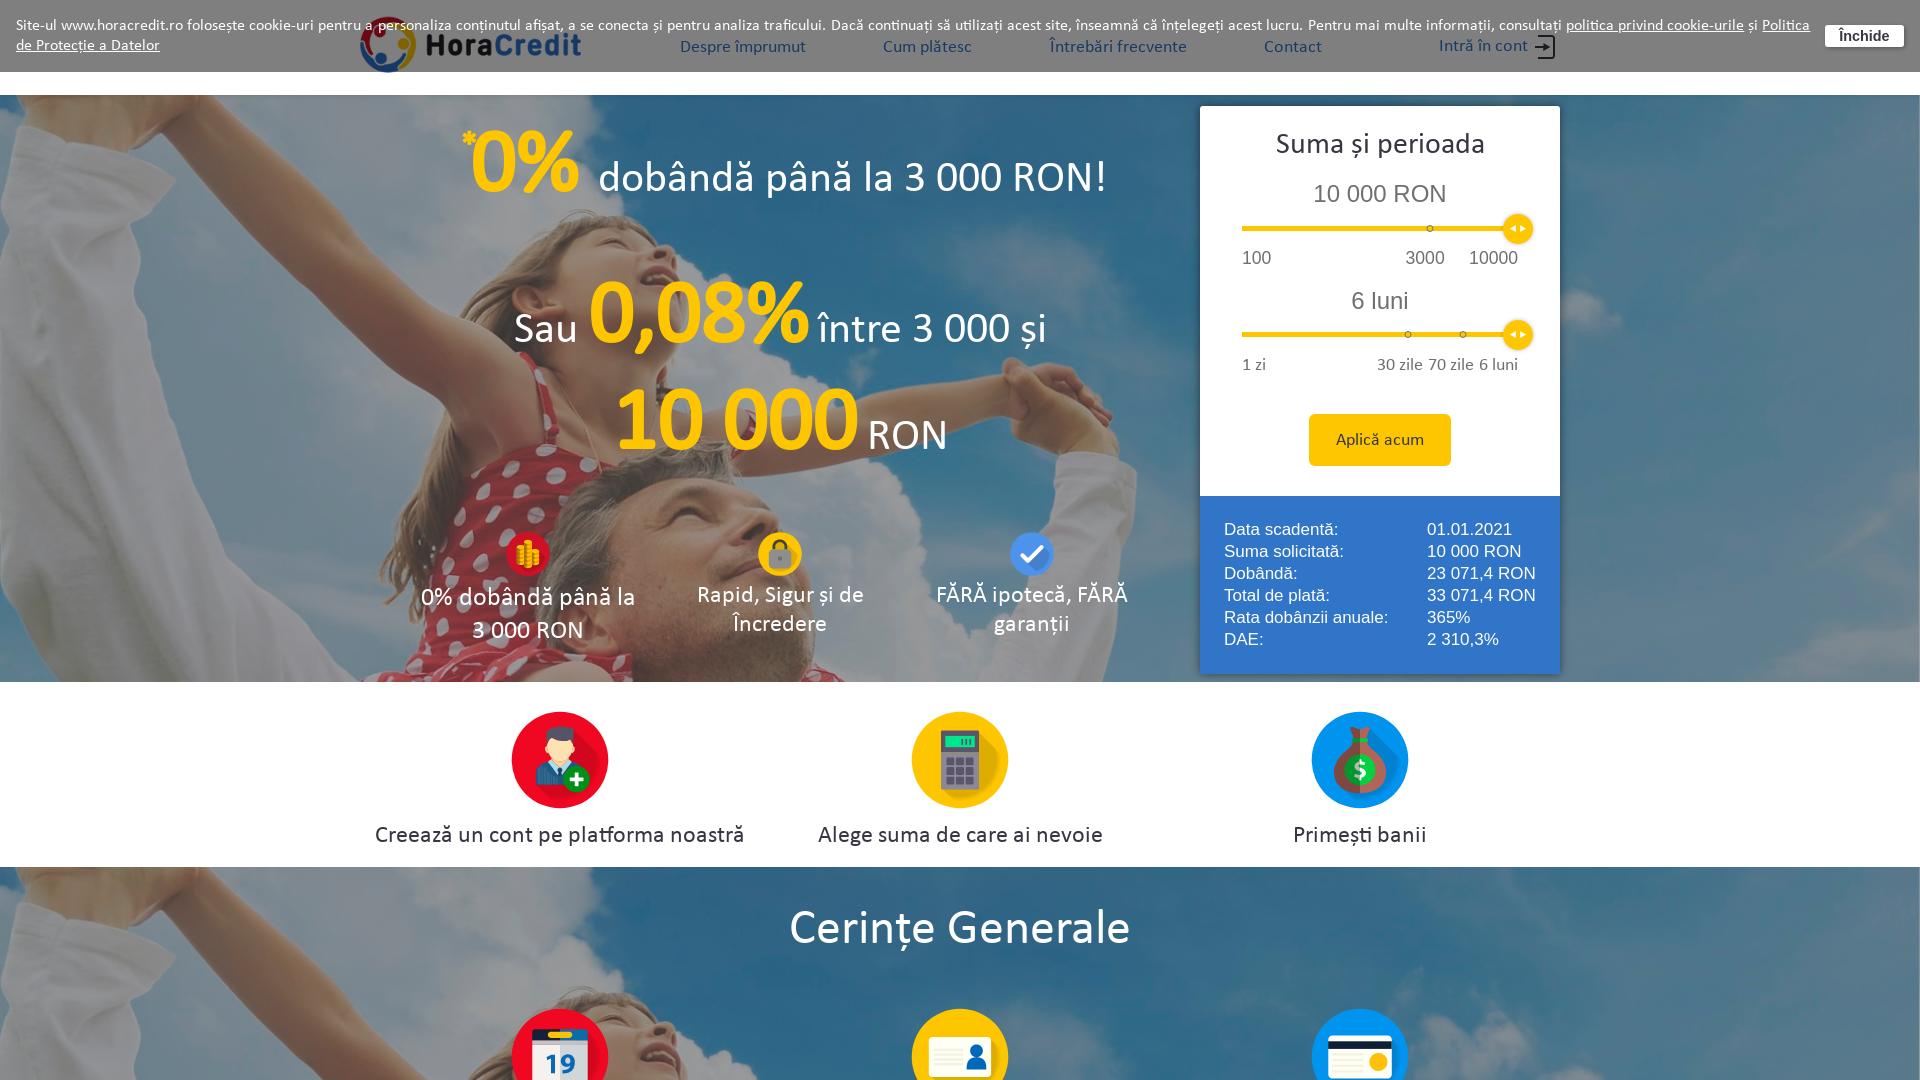 HoraCredit [CPS] RO website